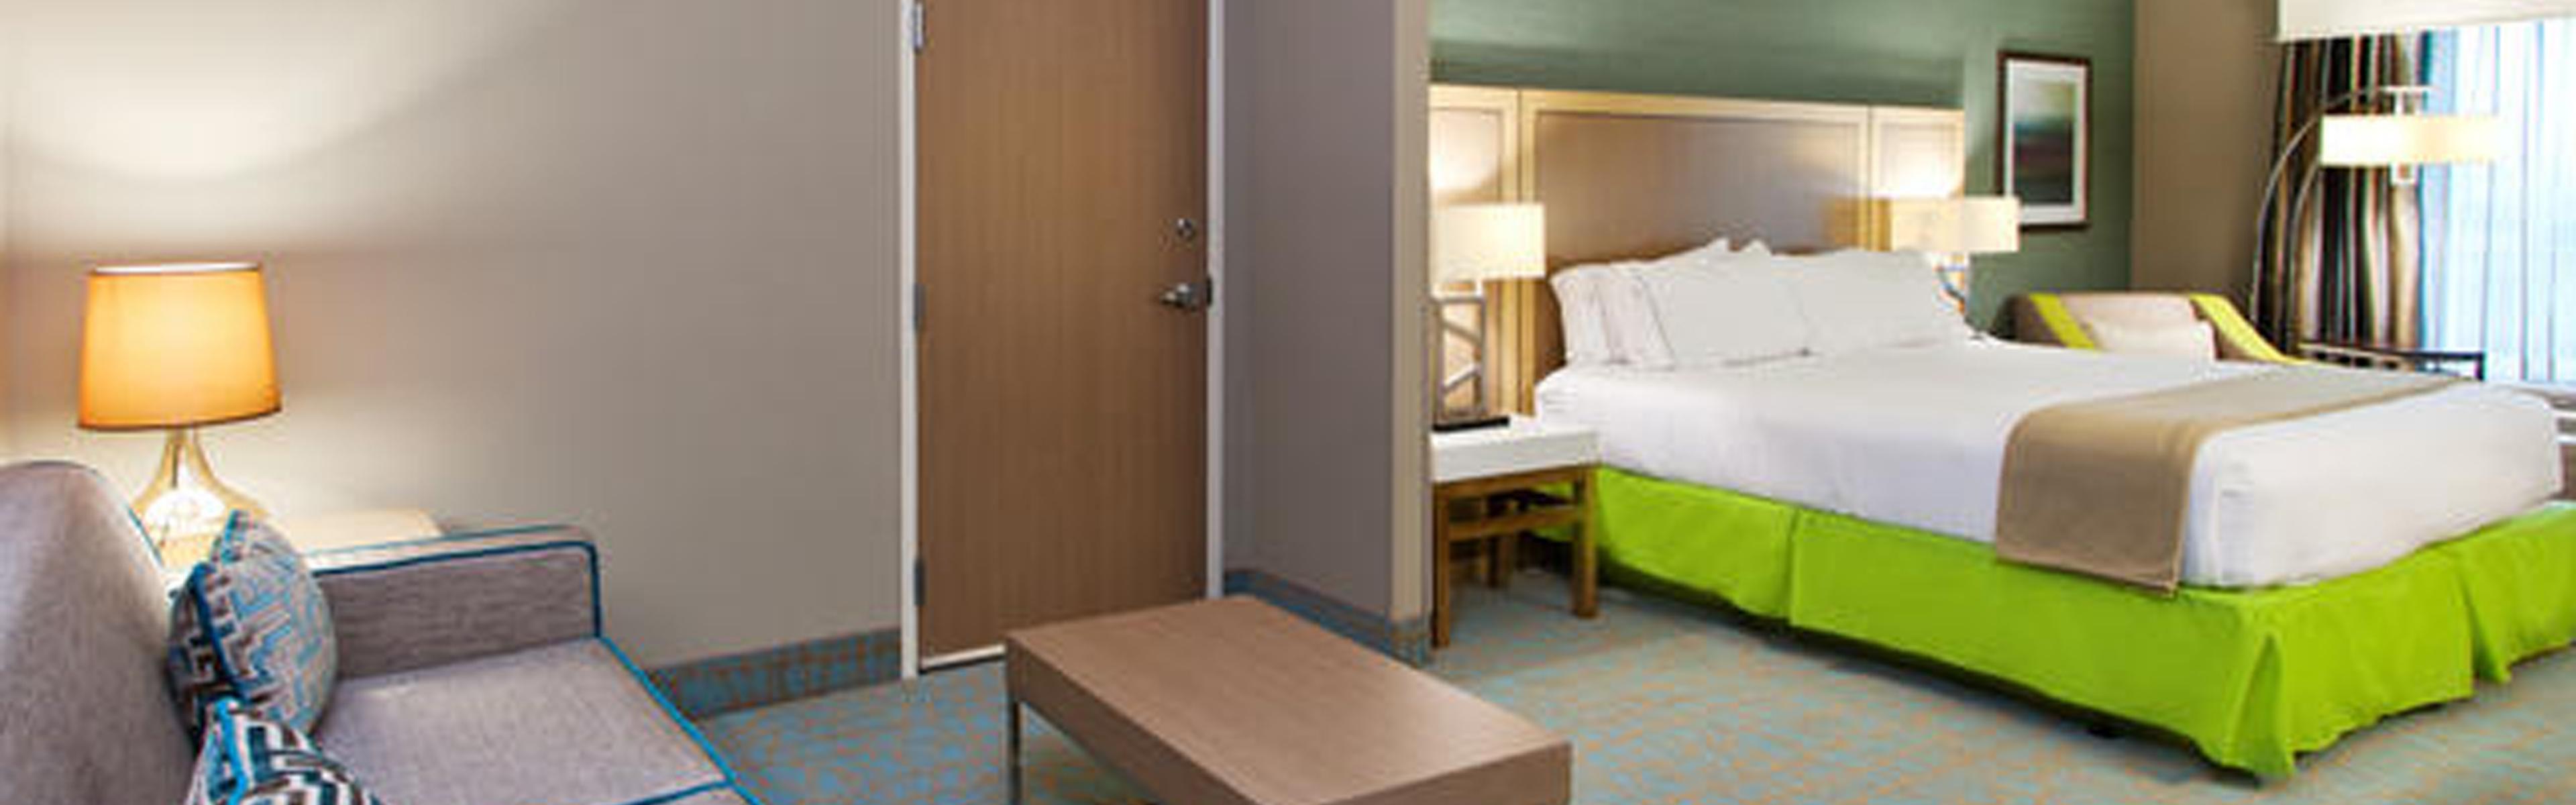 Holiday Inn Express & Suites Warner Robins North West image 1